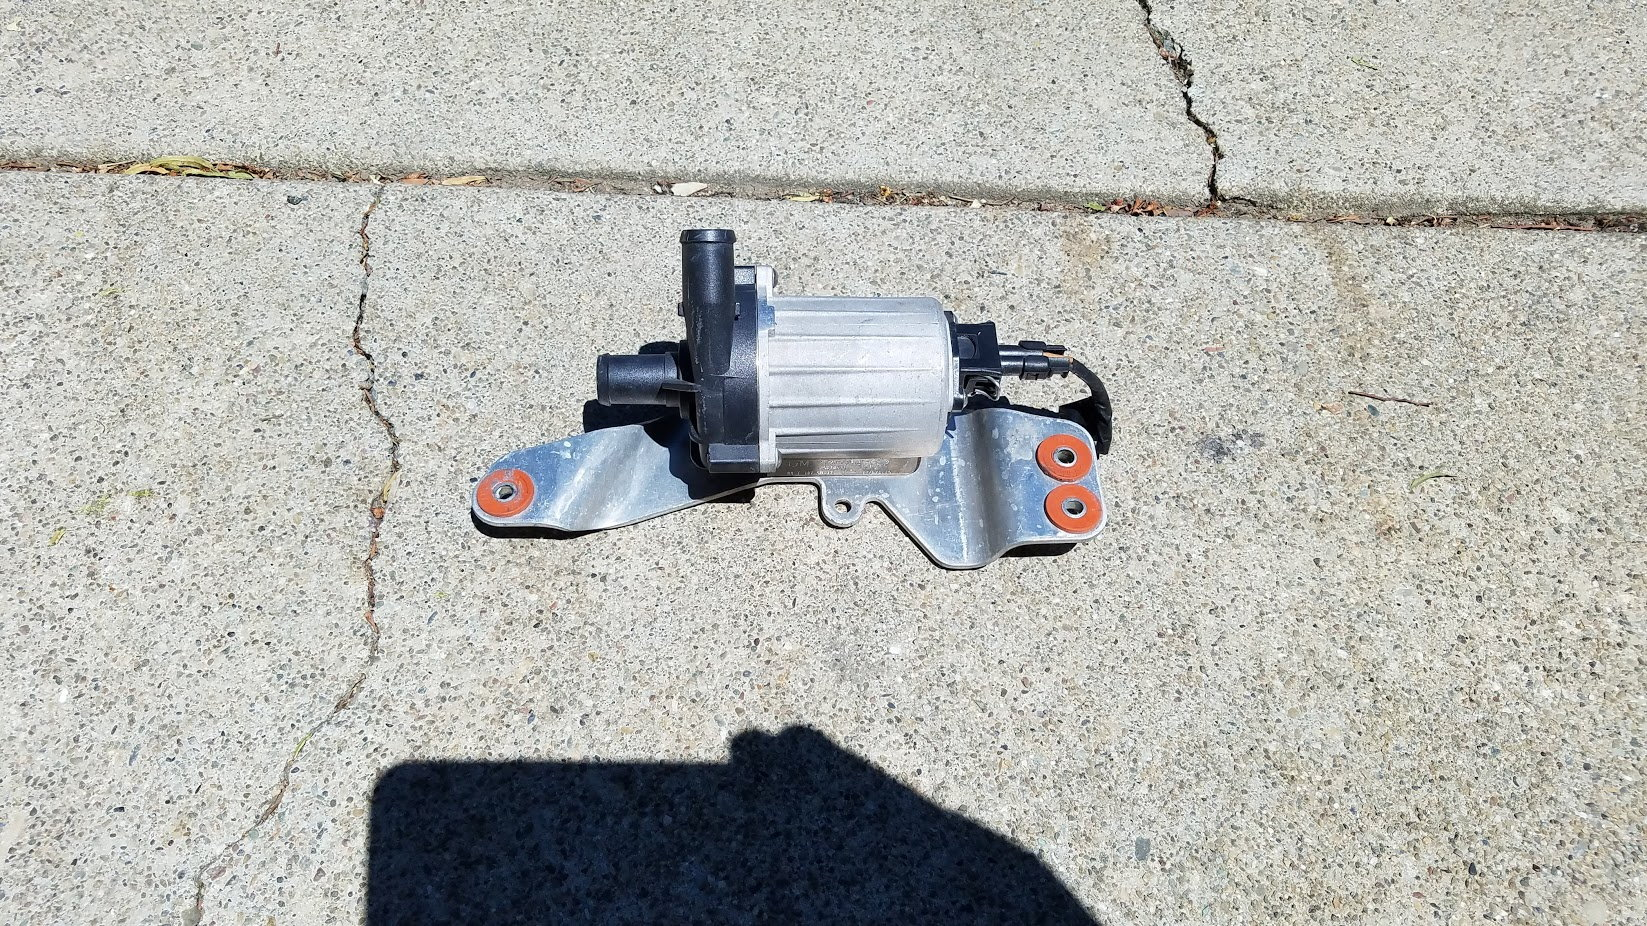 FS (For Sale) (3) ZR1 Intercooler Pumps For Sale $200-225